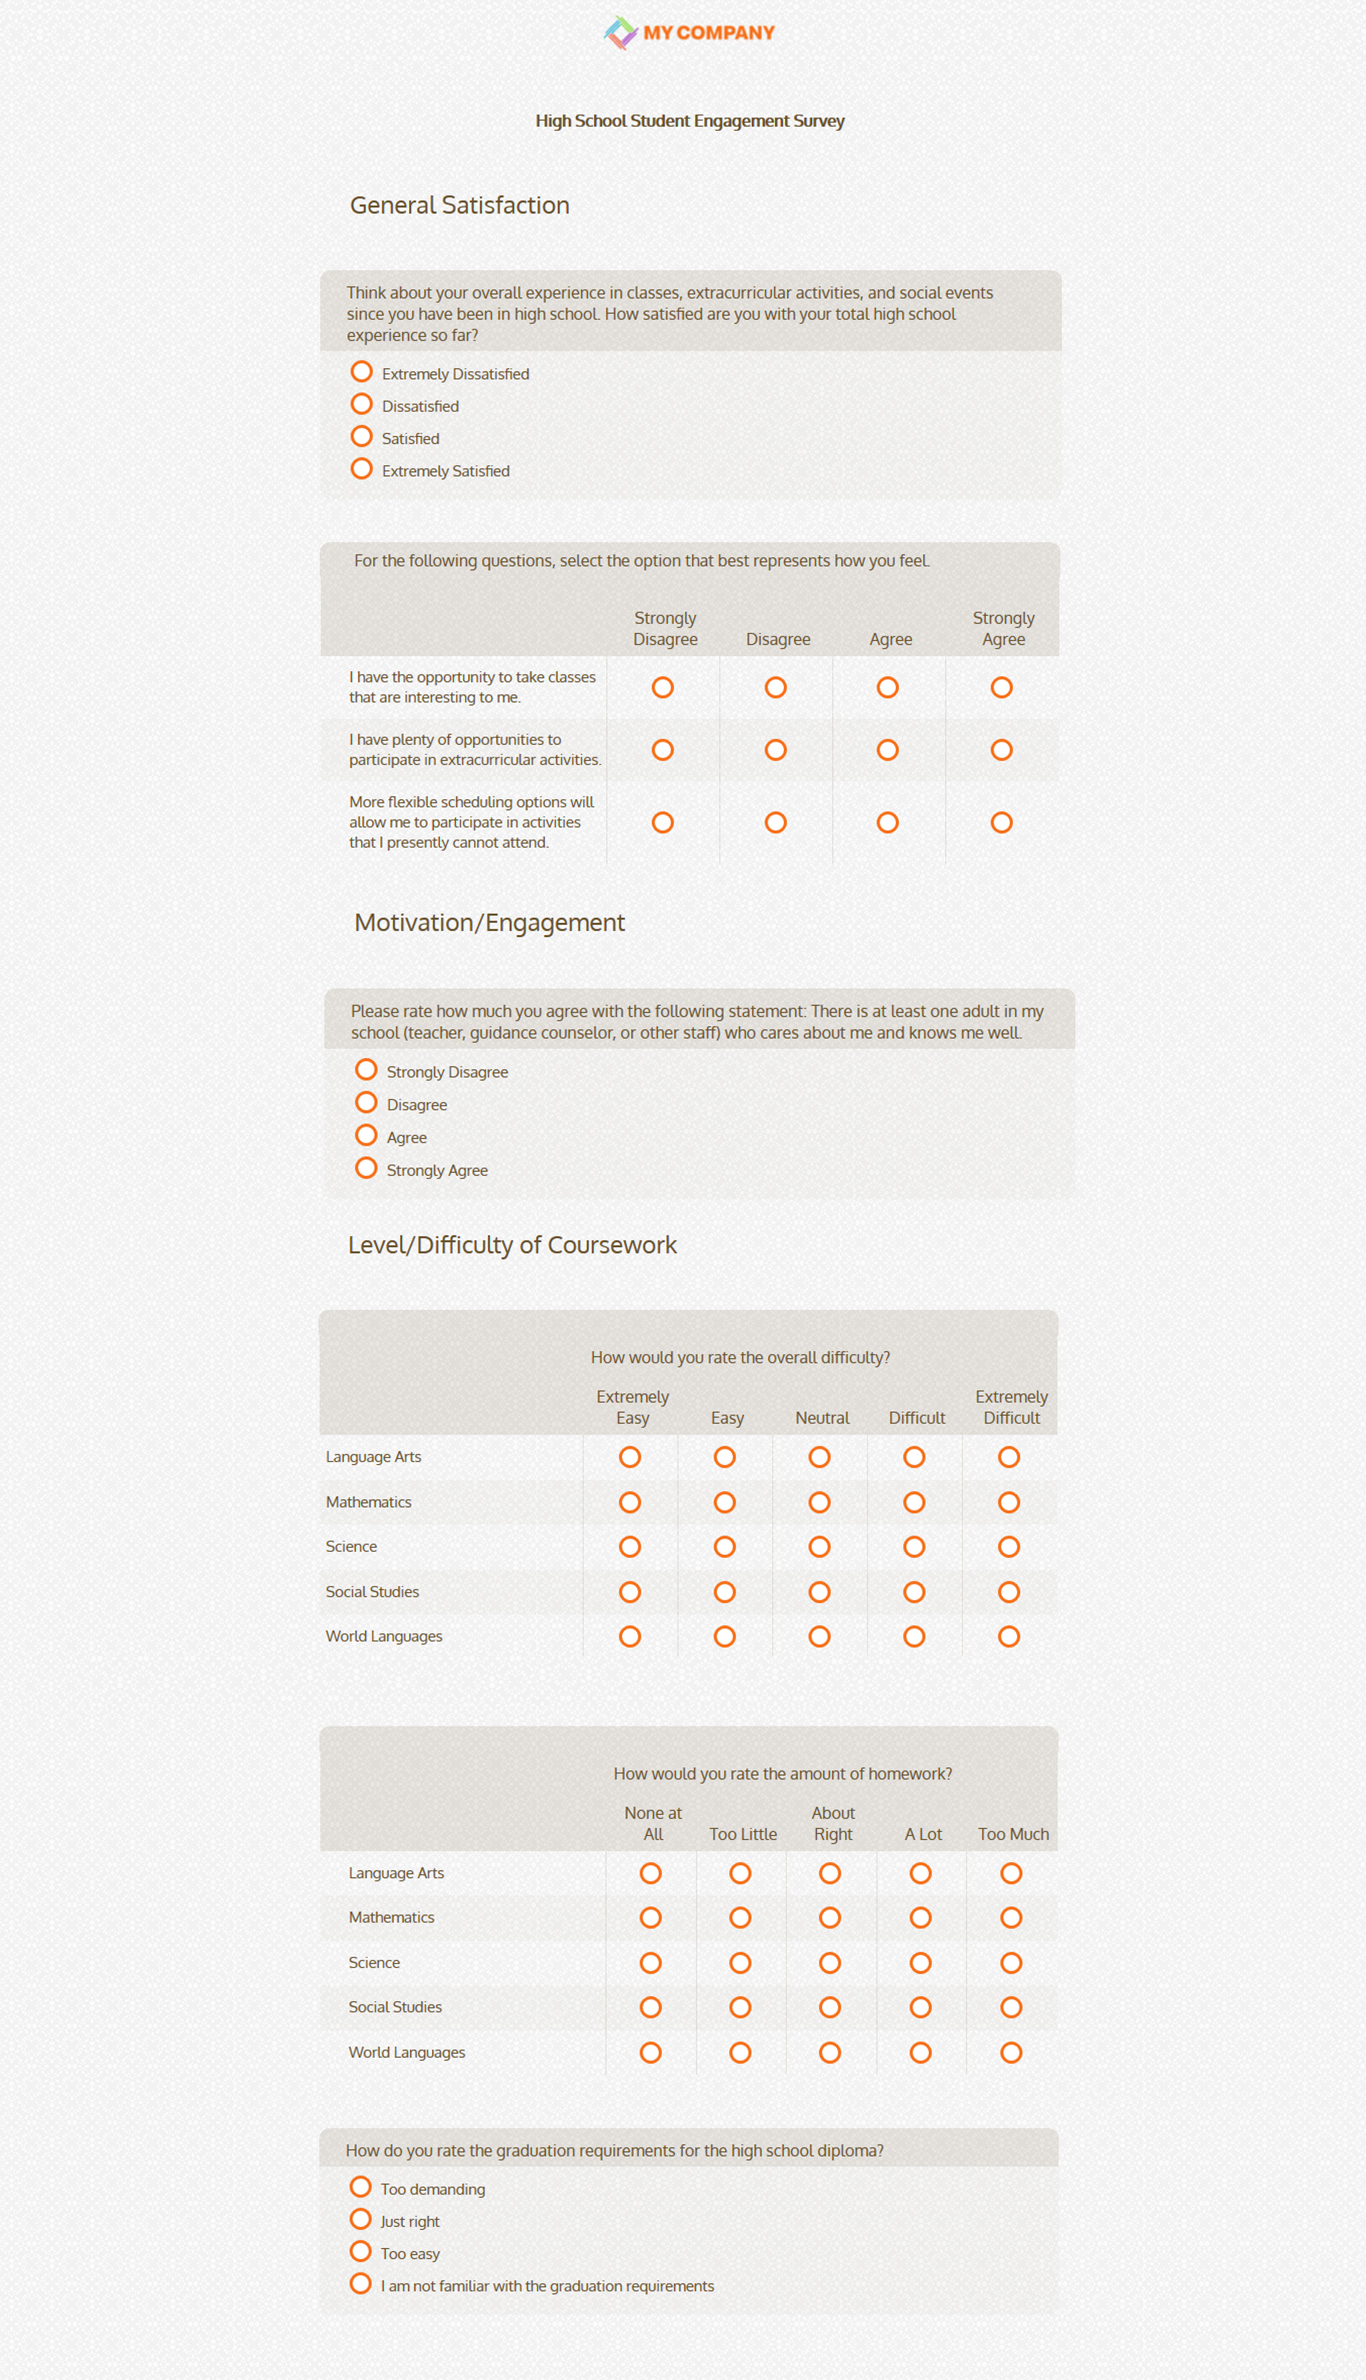 High School Student Engagement Survey Sample Template